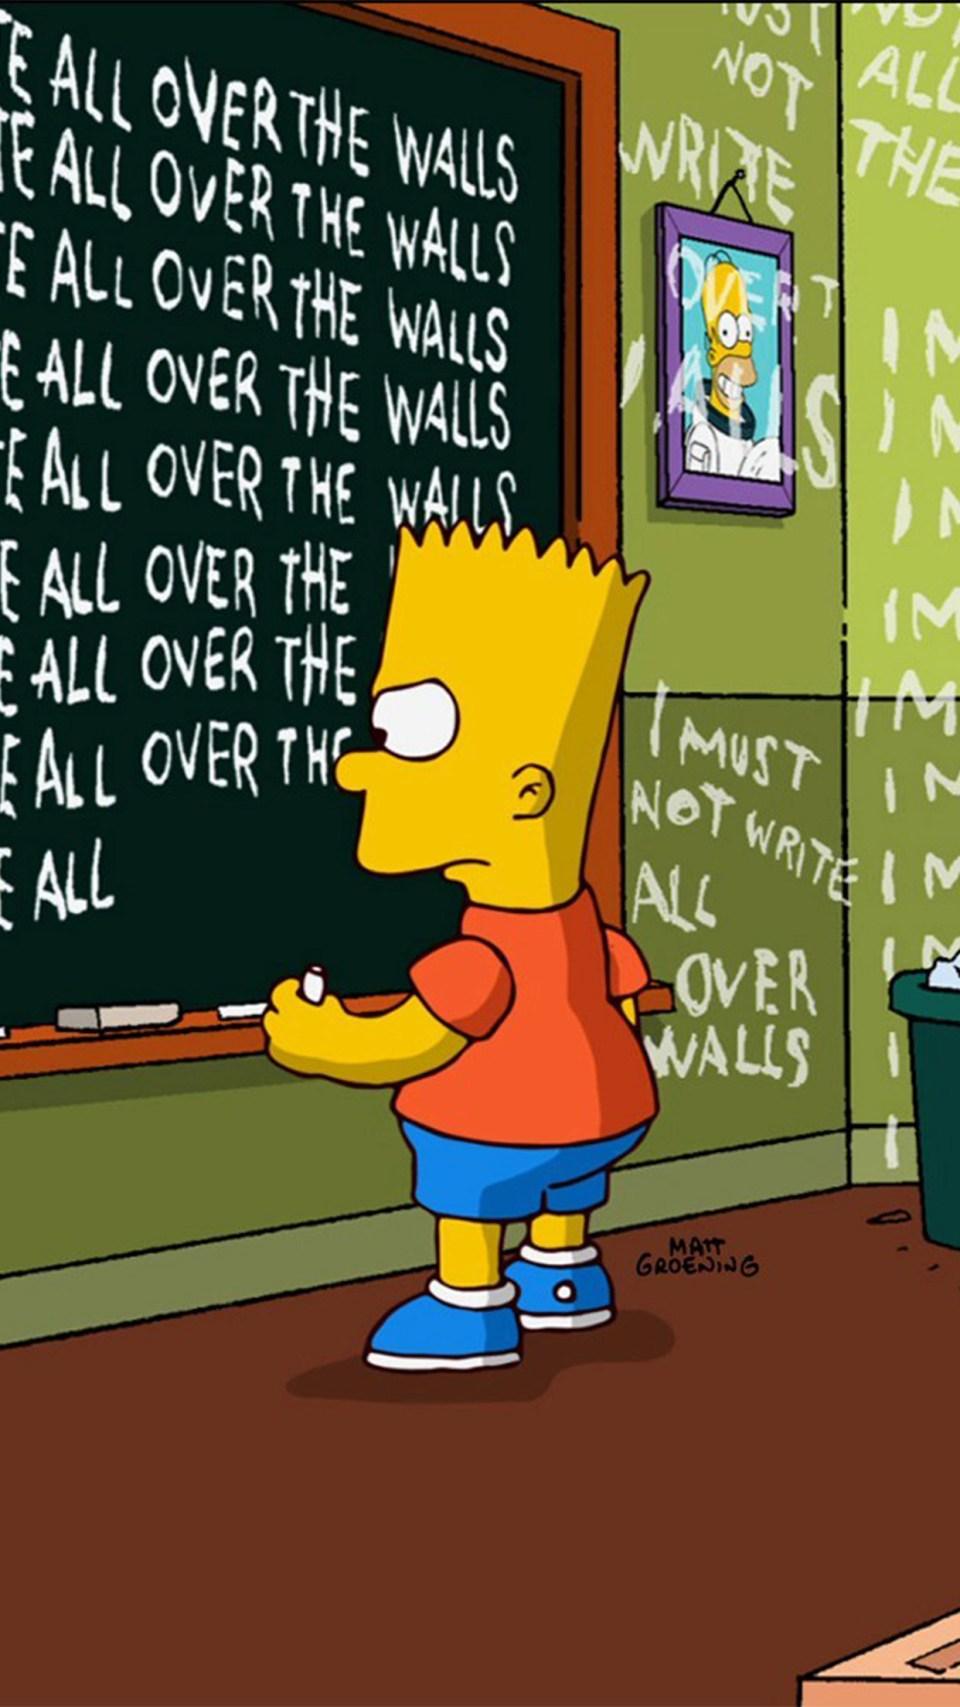 Fondos De Pantalla Tumblr Sad De Bart Simpson - fondo de ...